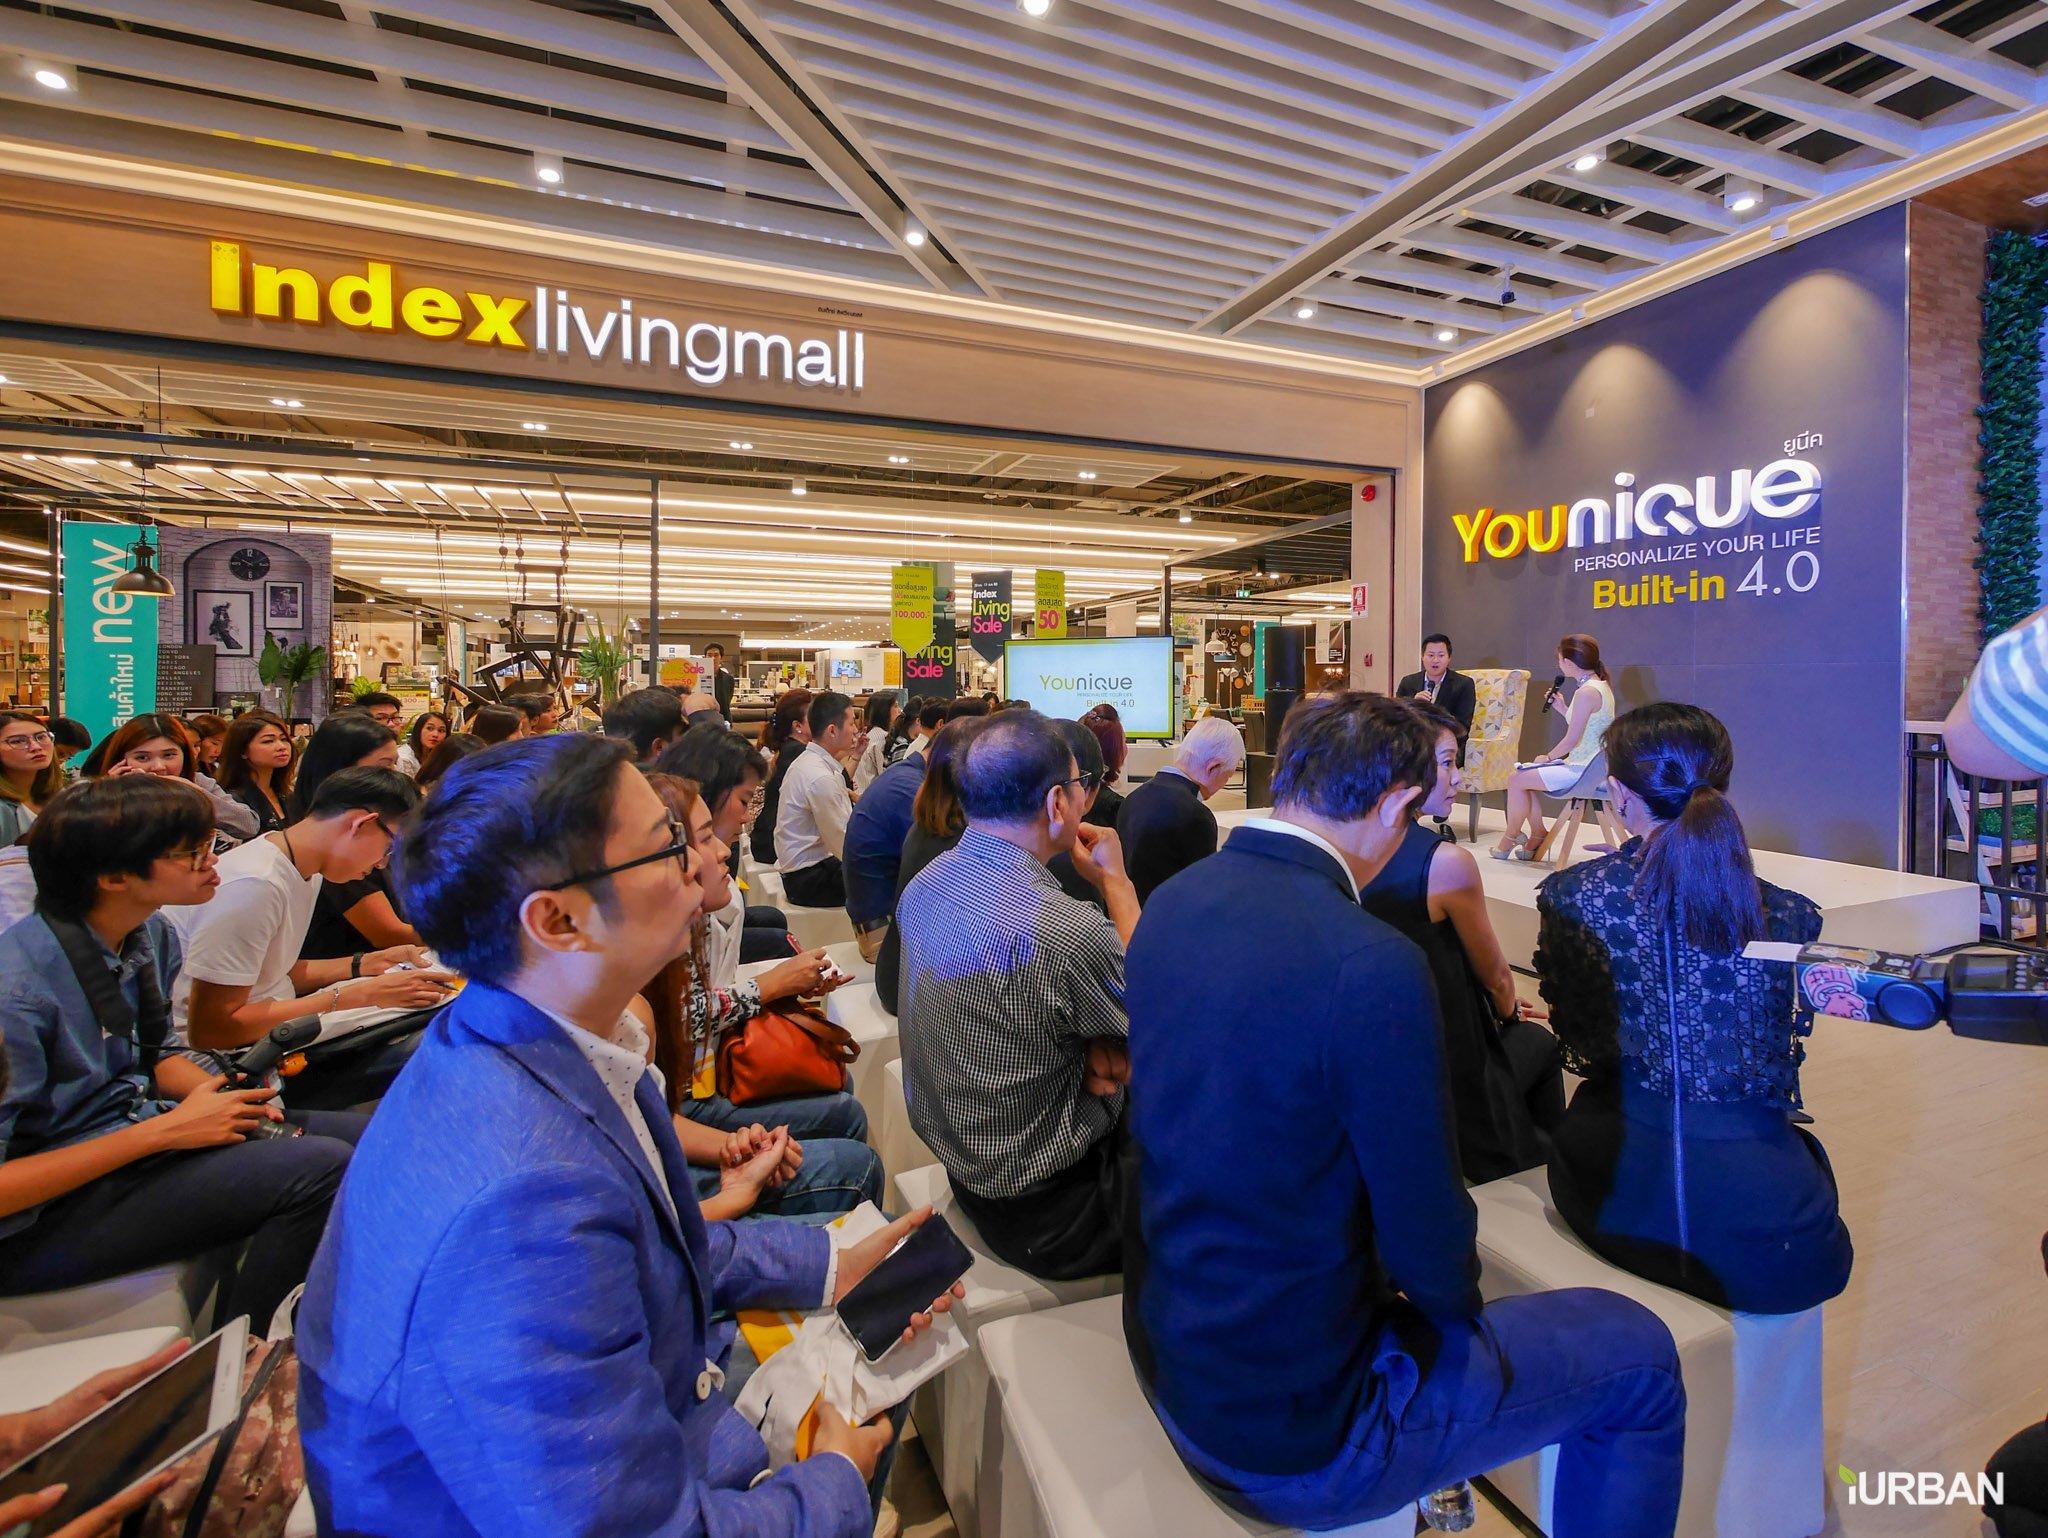 Younique เทคโนโลยีบิวท์อิน 4.0 ครั้งแรกในไทย มีเป็นล้านดีไซน์ รู้ราคาใน 1 นาที โดย Index Livingmall 48 - Built-in